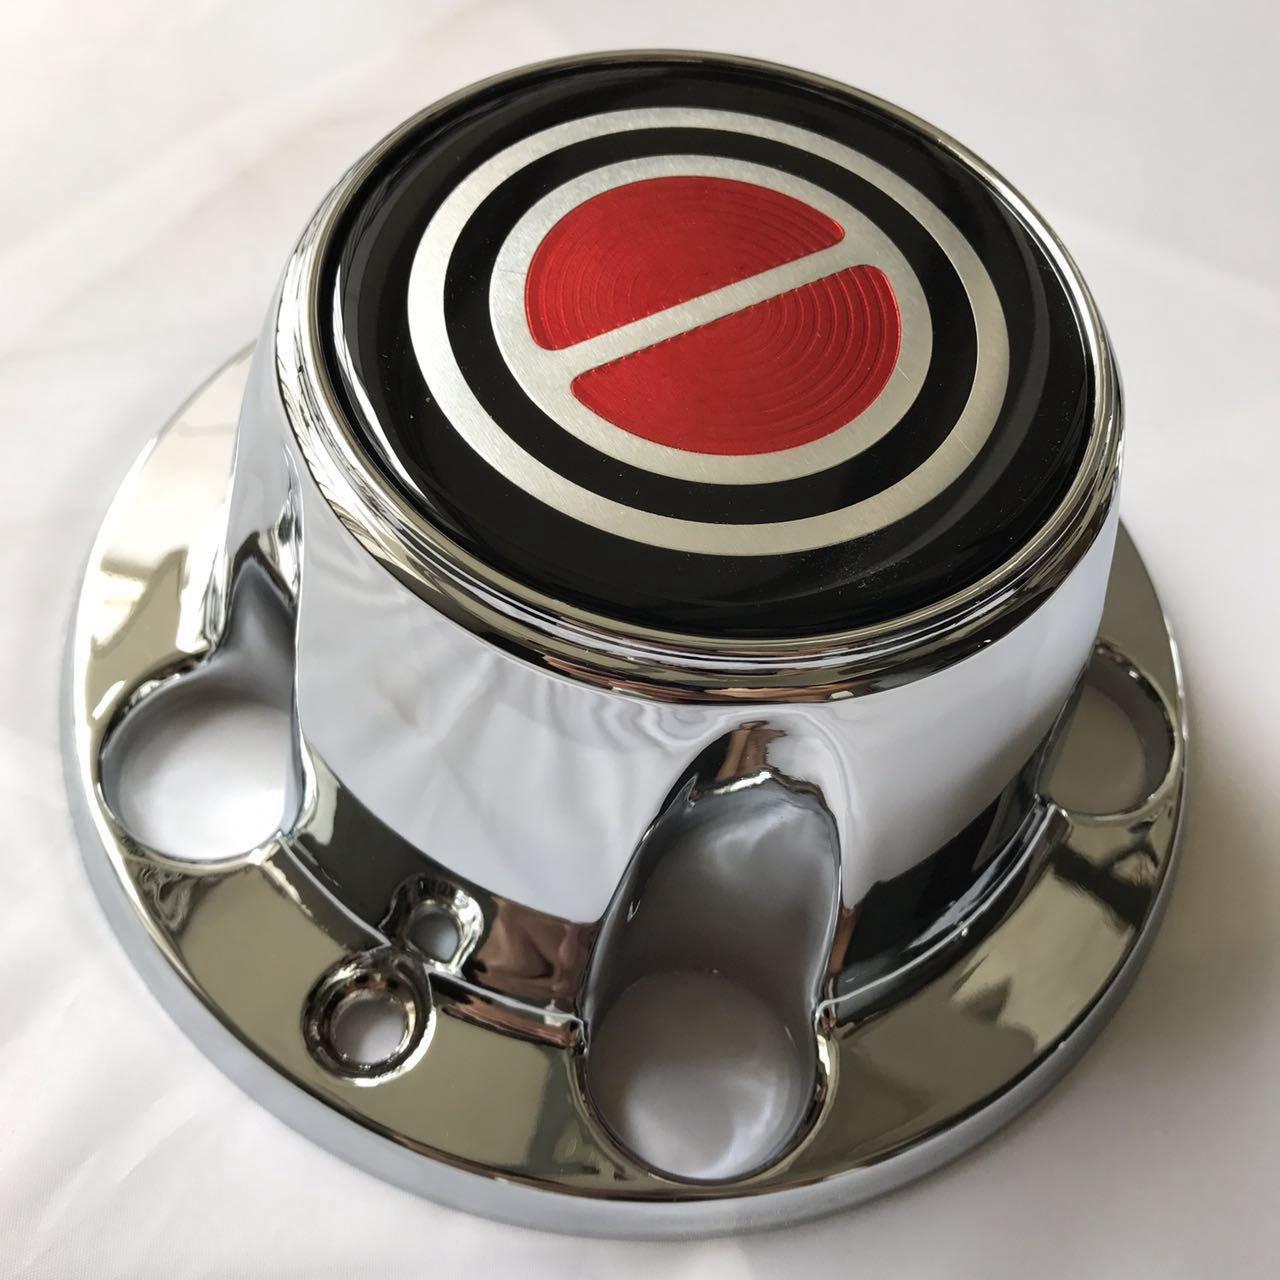 Amazon.com: 1980-1996 FORD F150 BRONCO VAN Chrome Wheel Hub Center Caps RED Center 4 PCS: Automotive